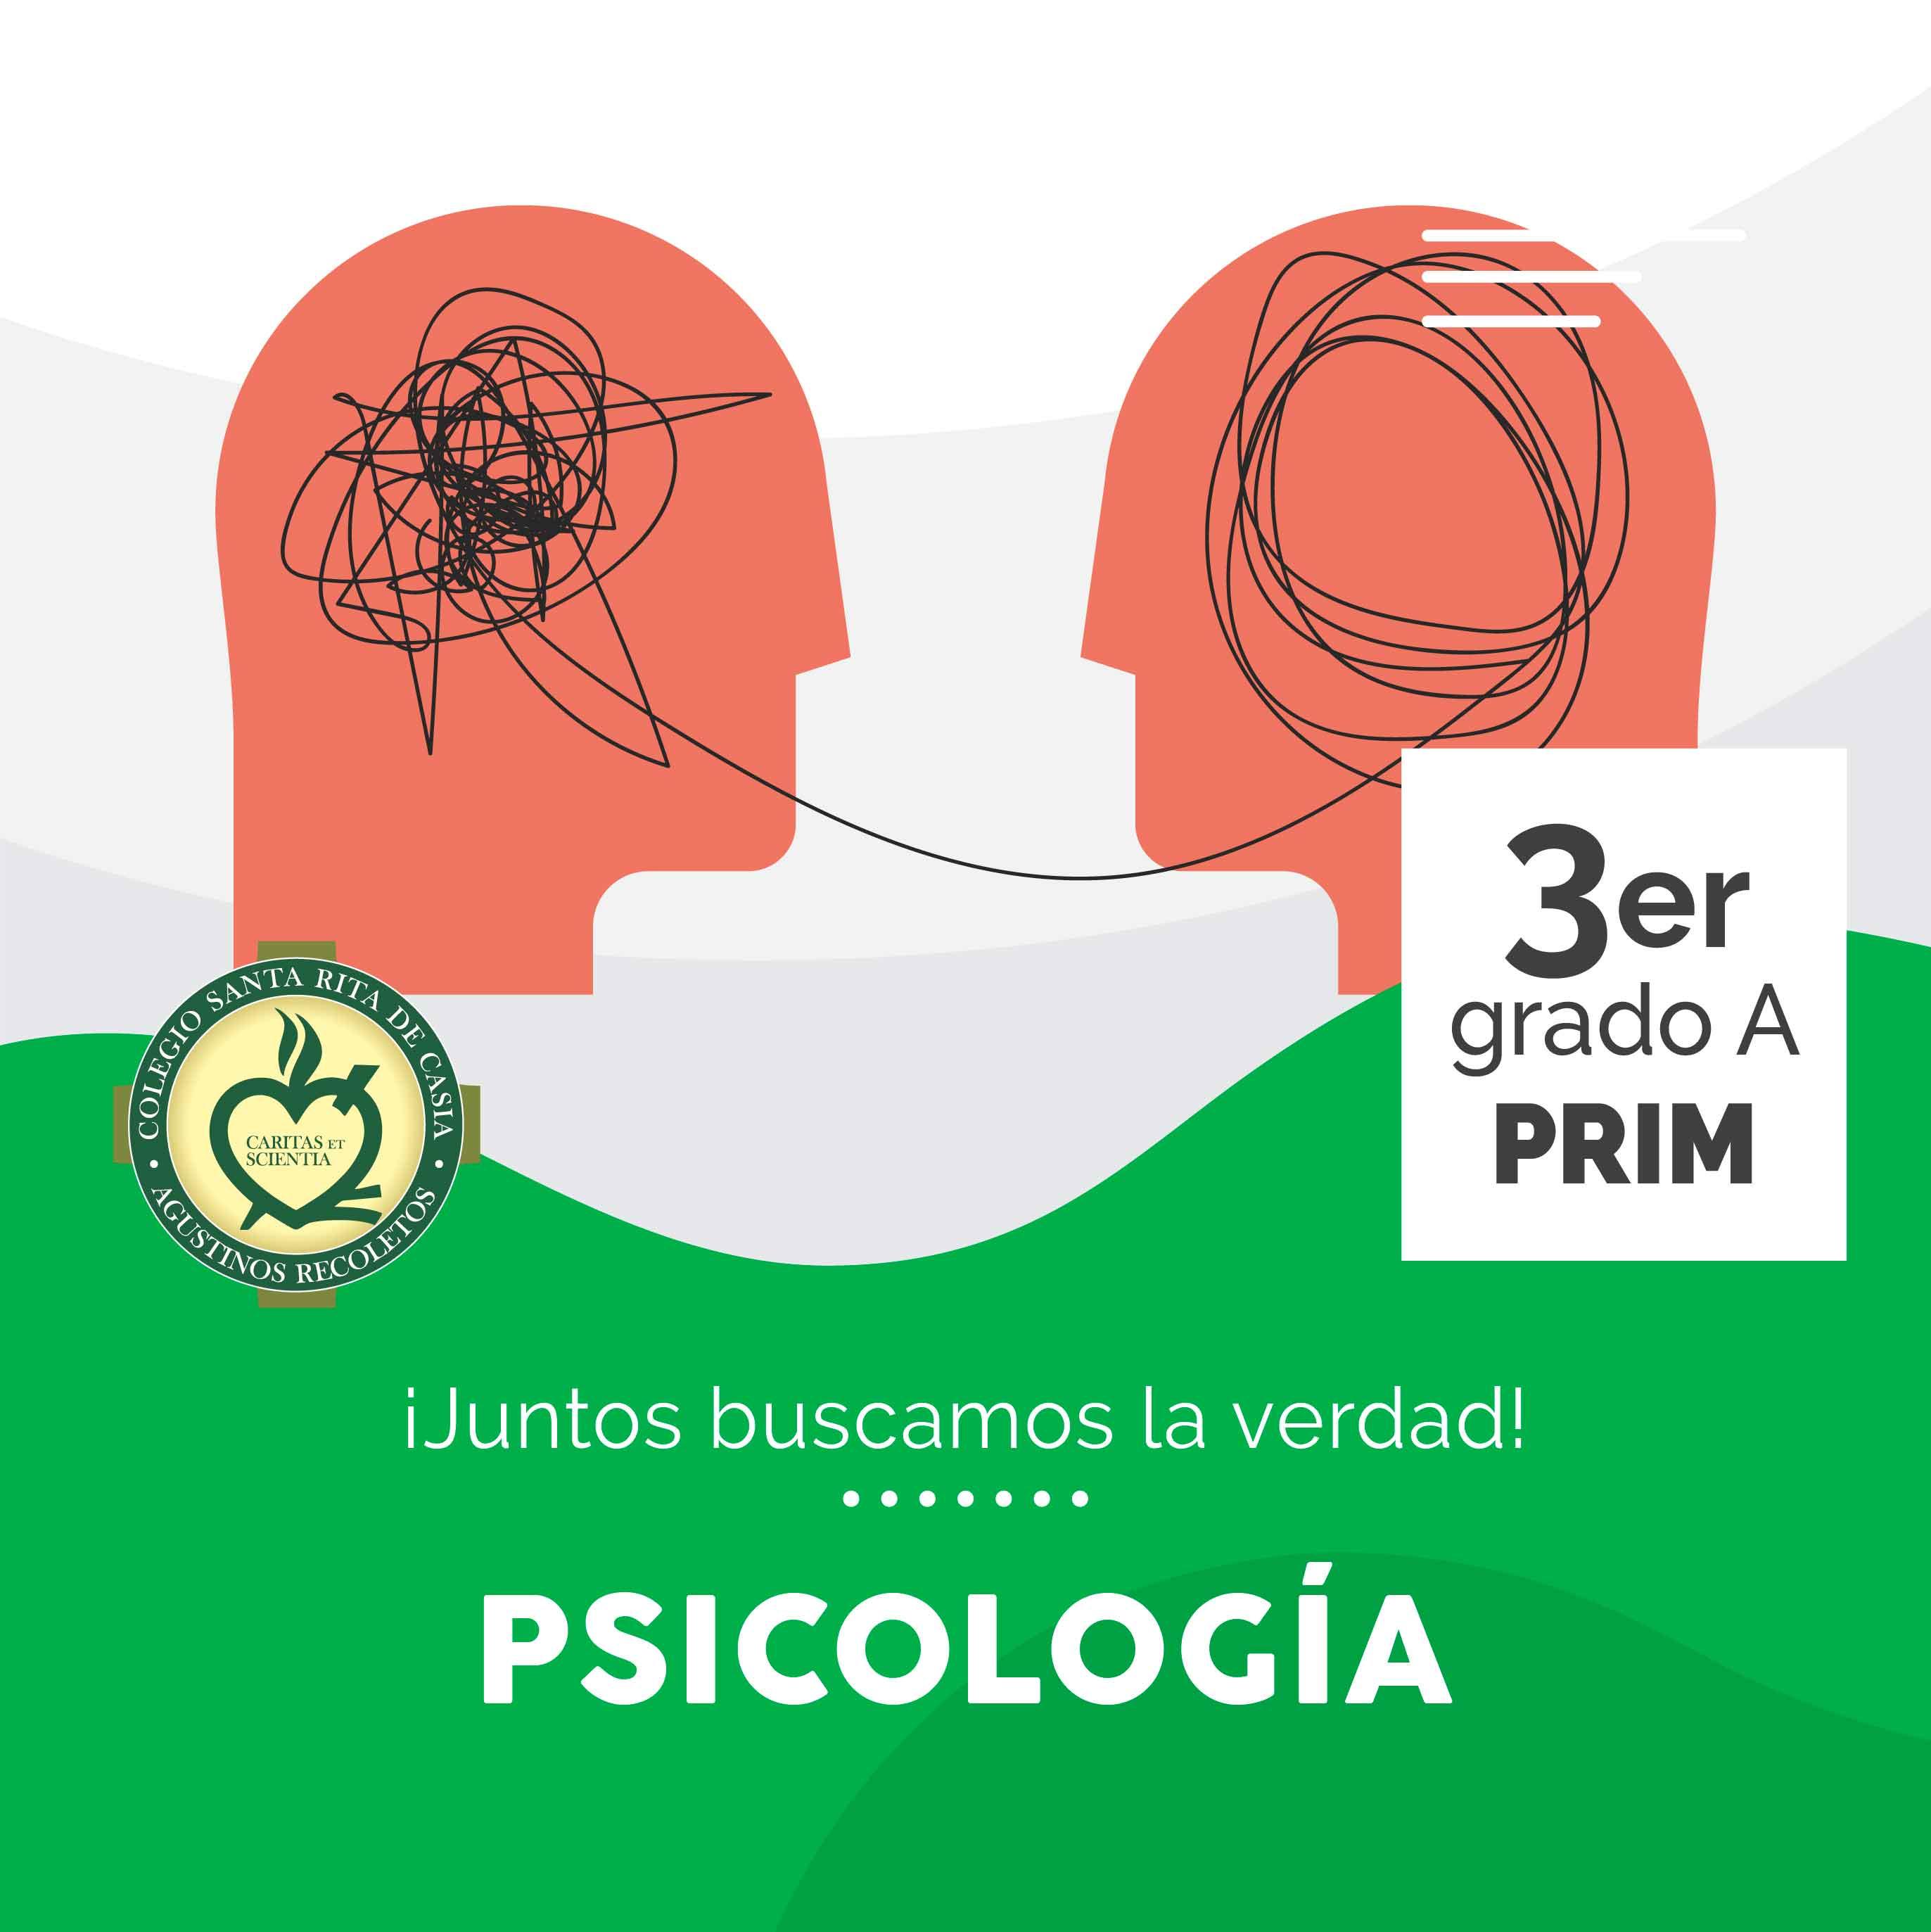 Psicología 3er Grado A